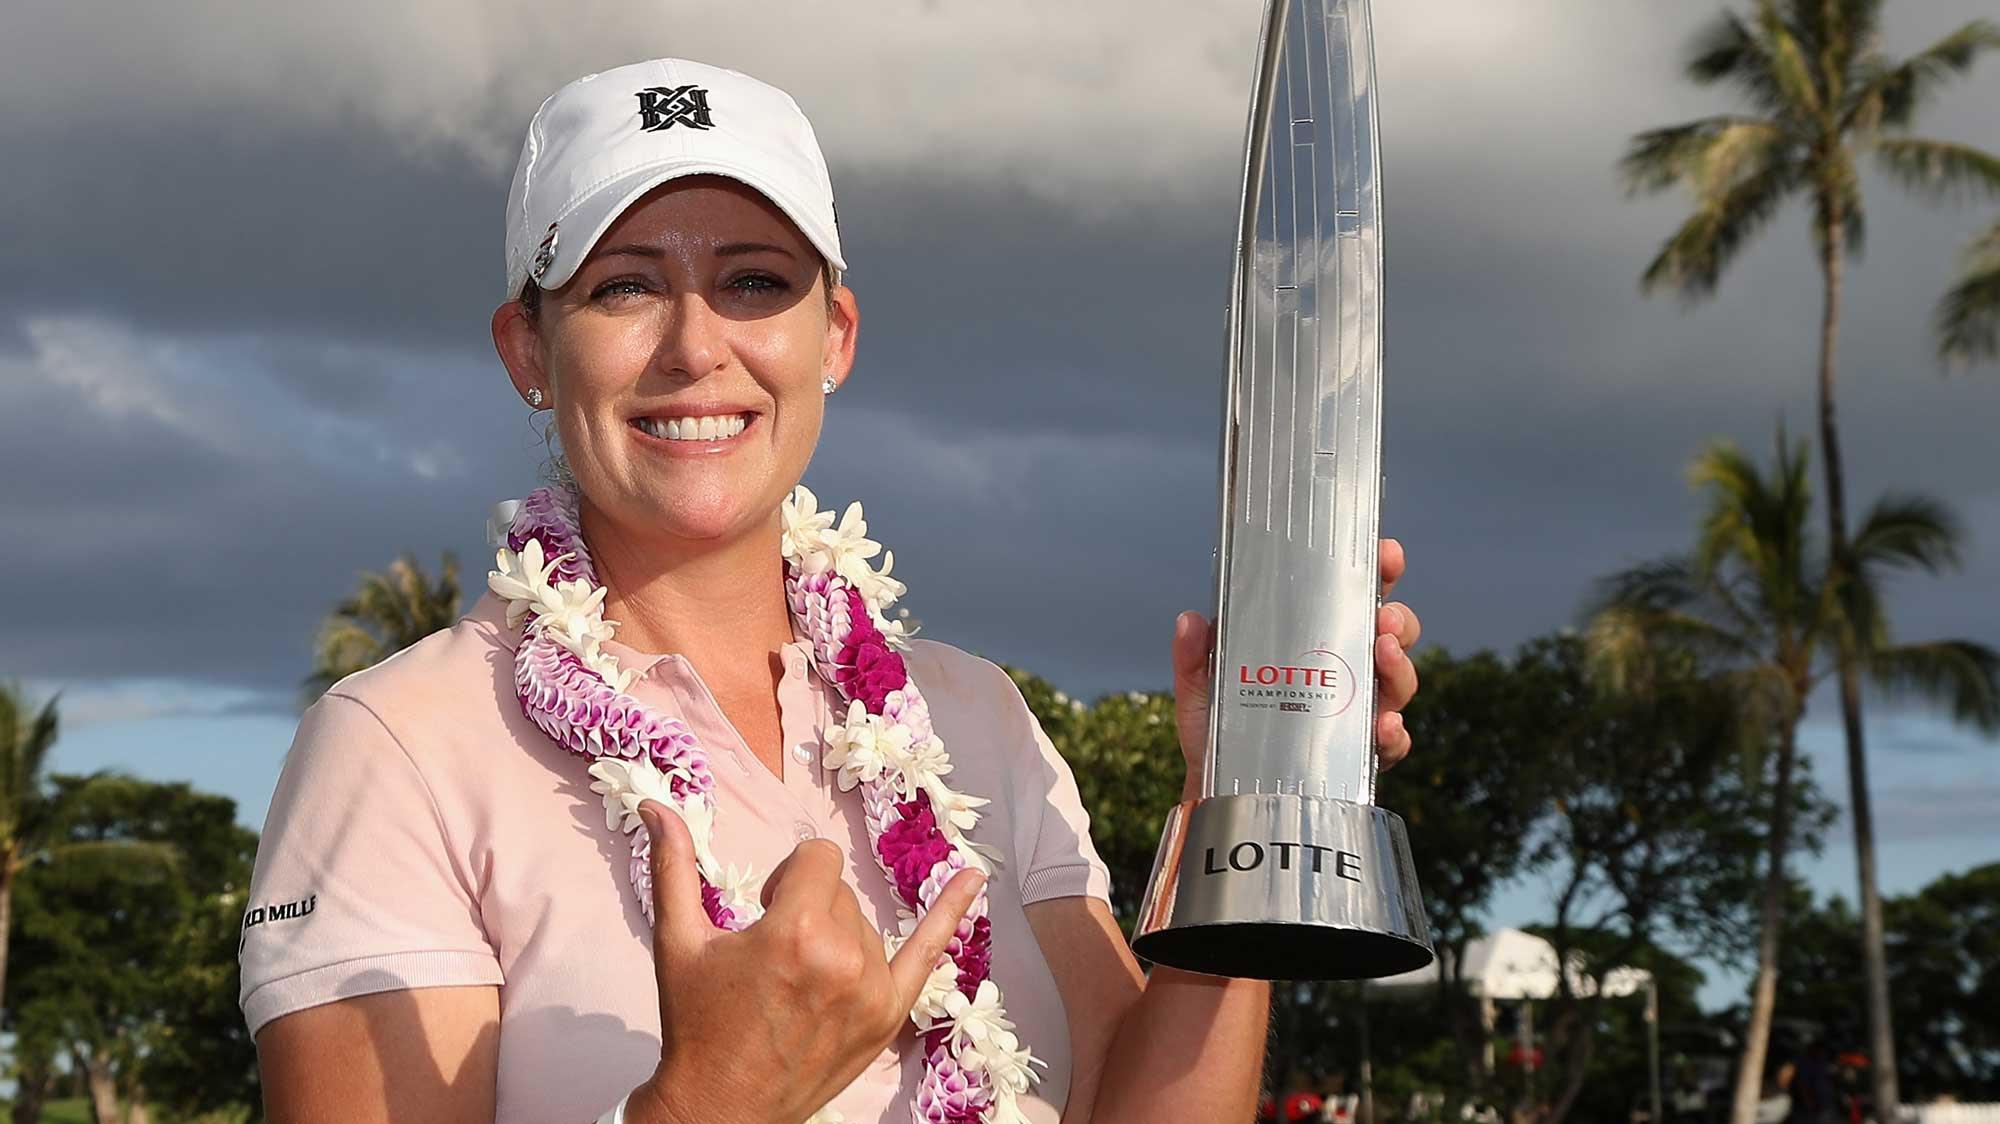 Cristie Kerr with Lotte trophy